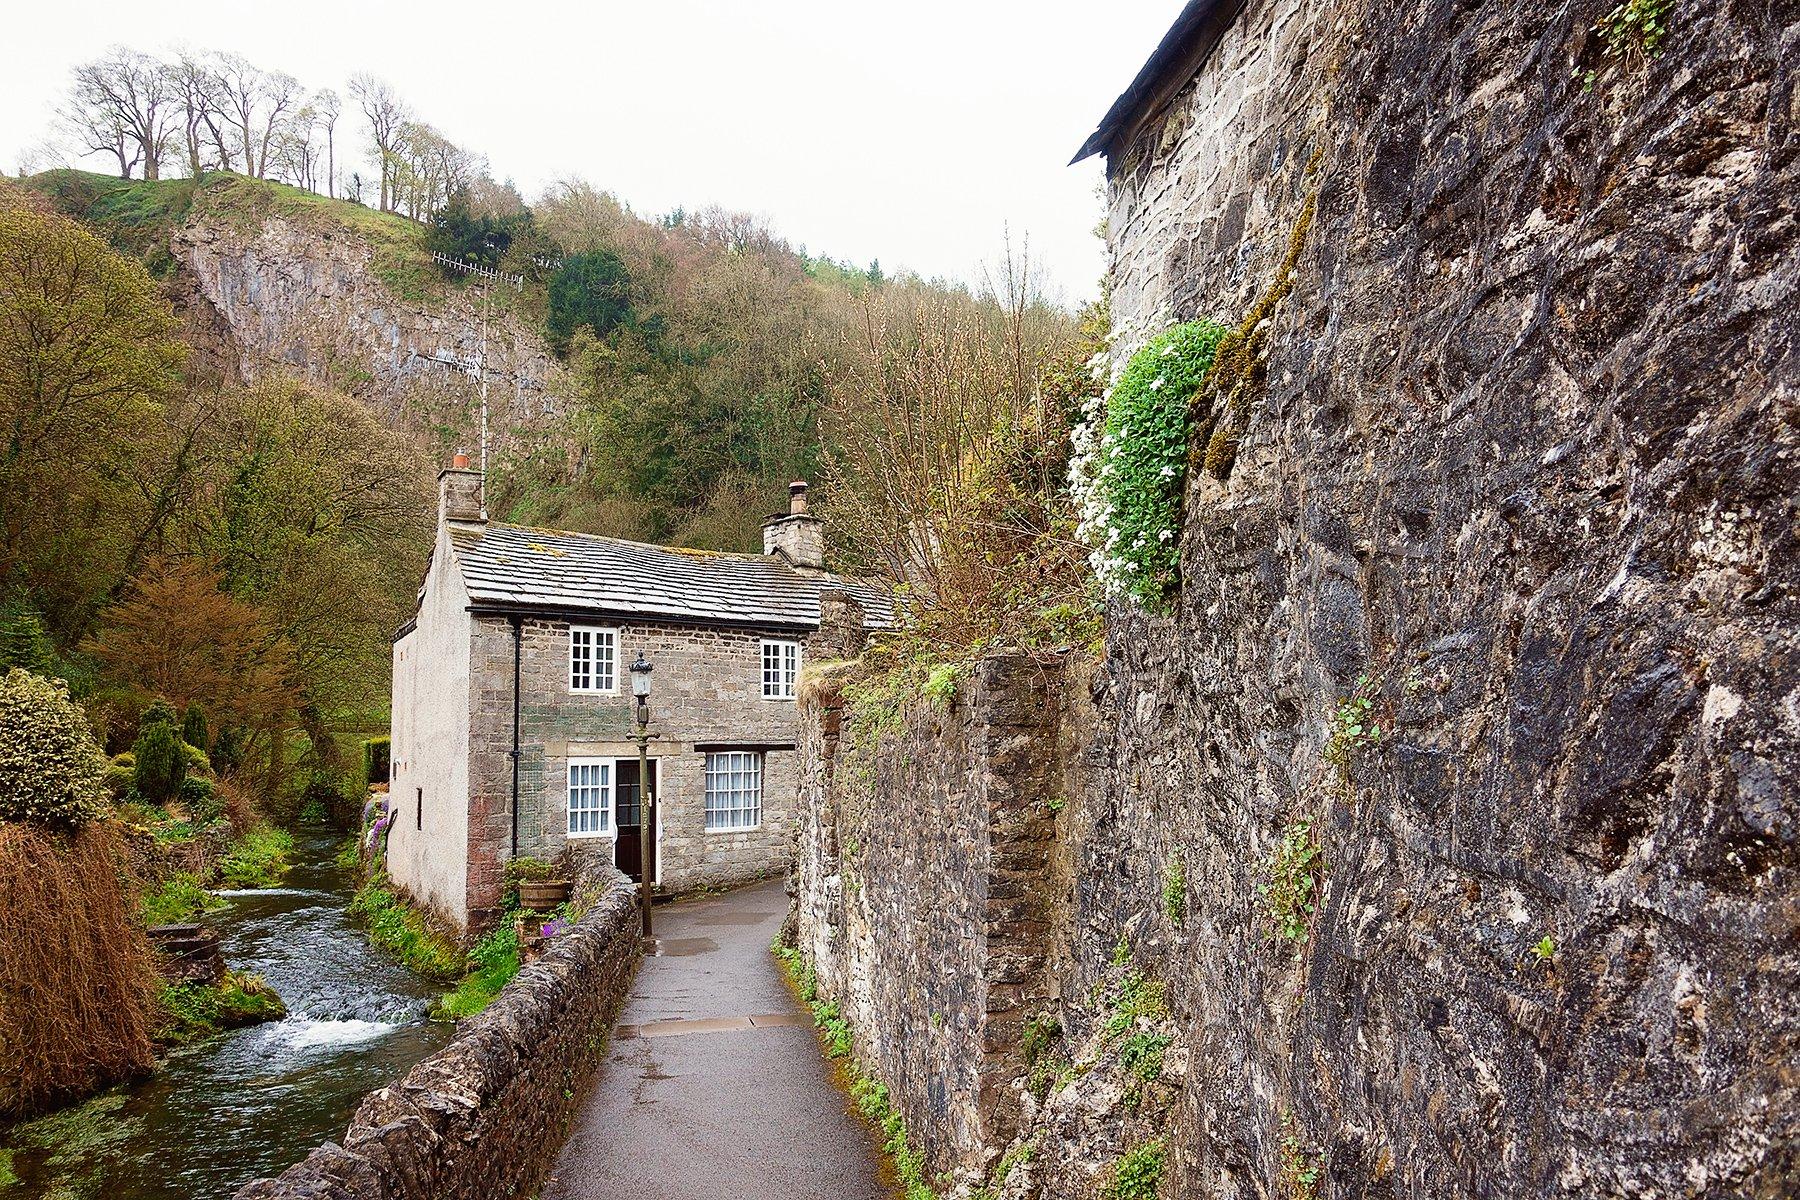 Castleton in the Peak District